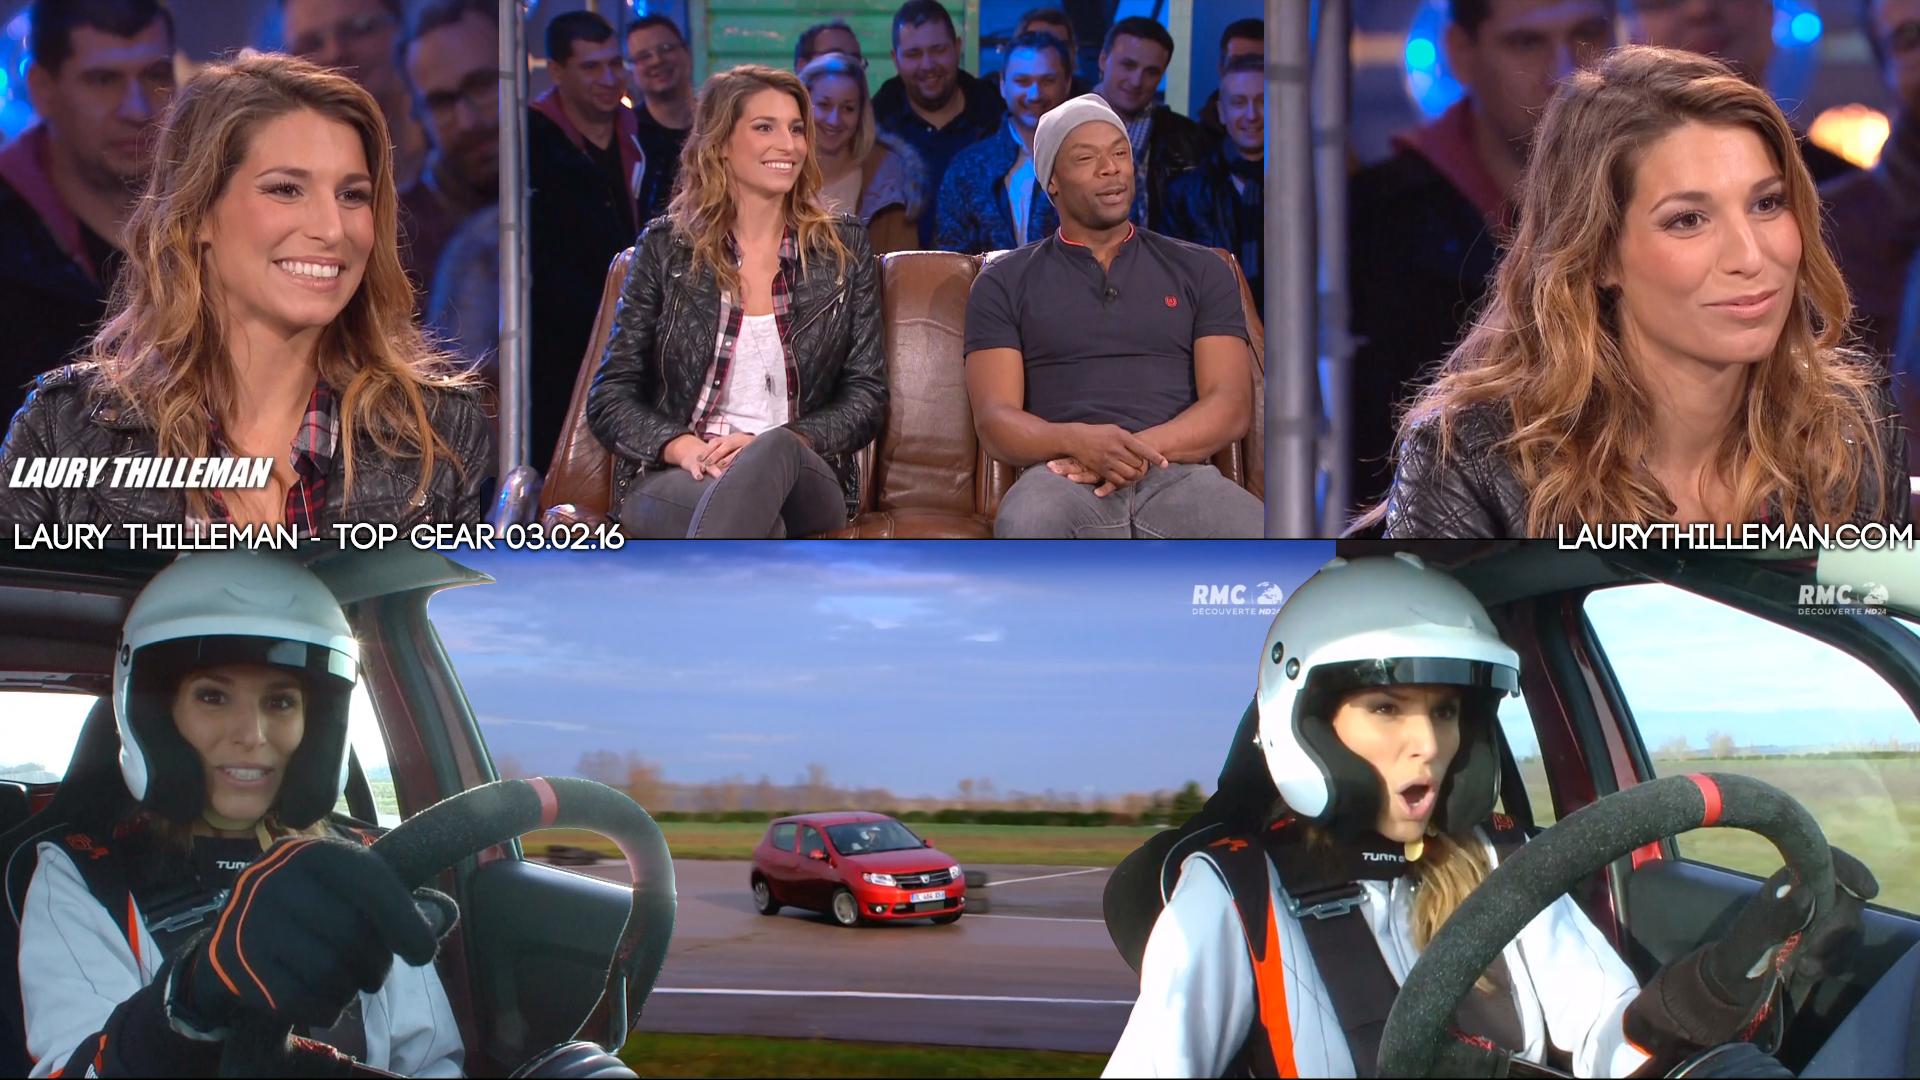 Laury-Thilleman-Top-Gear-030216-RMC-Decouverte